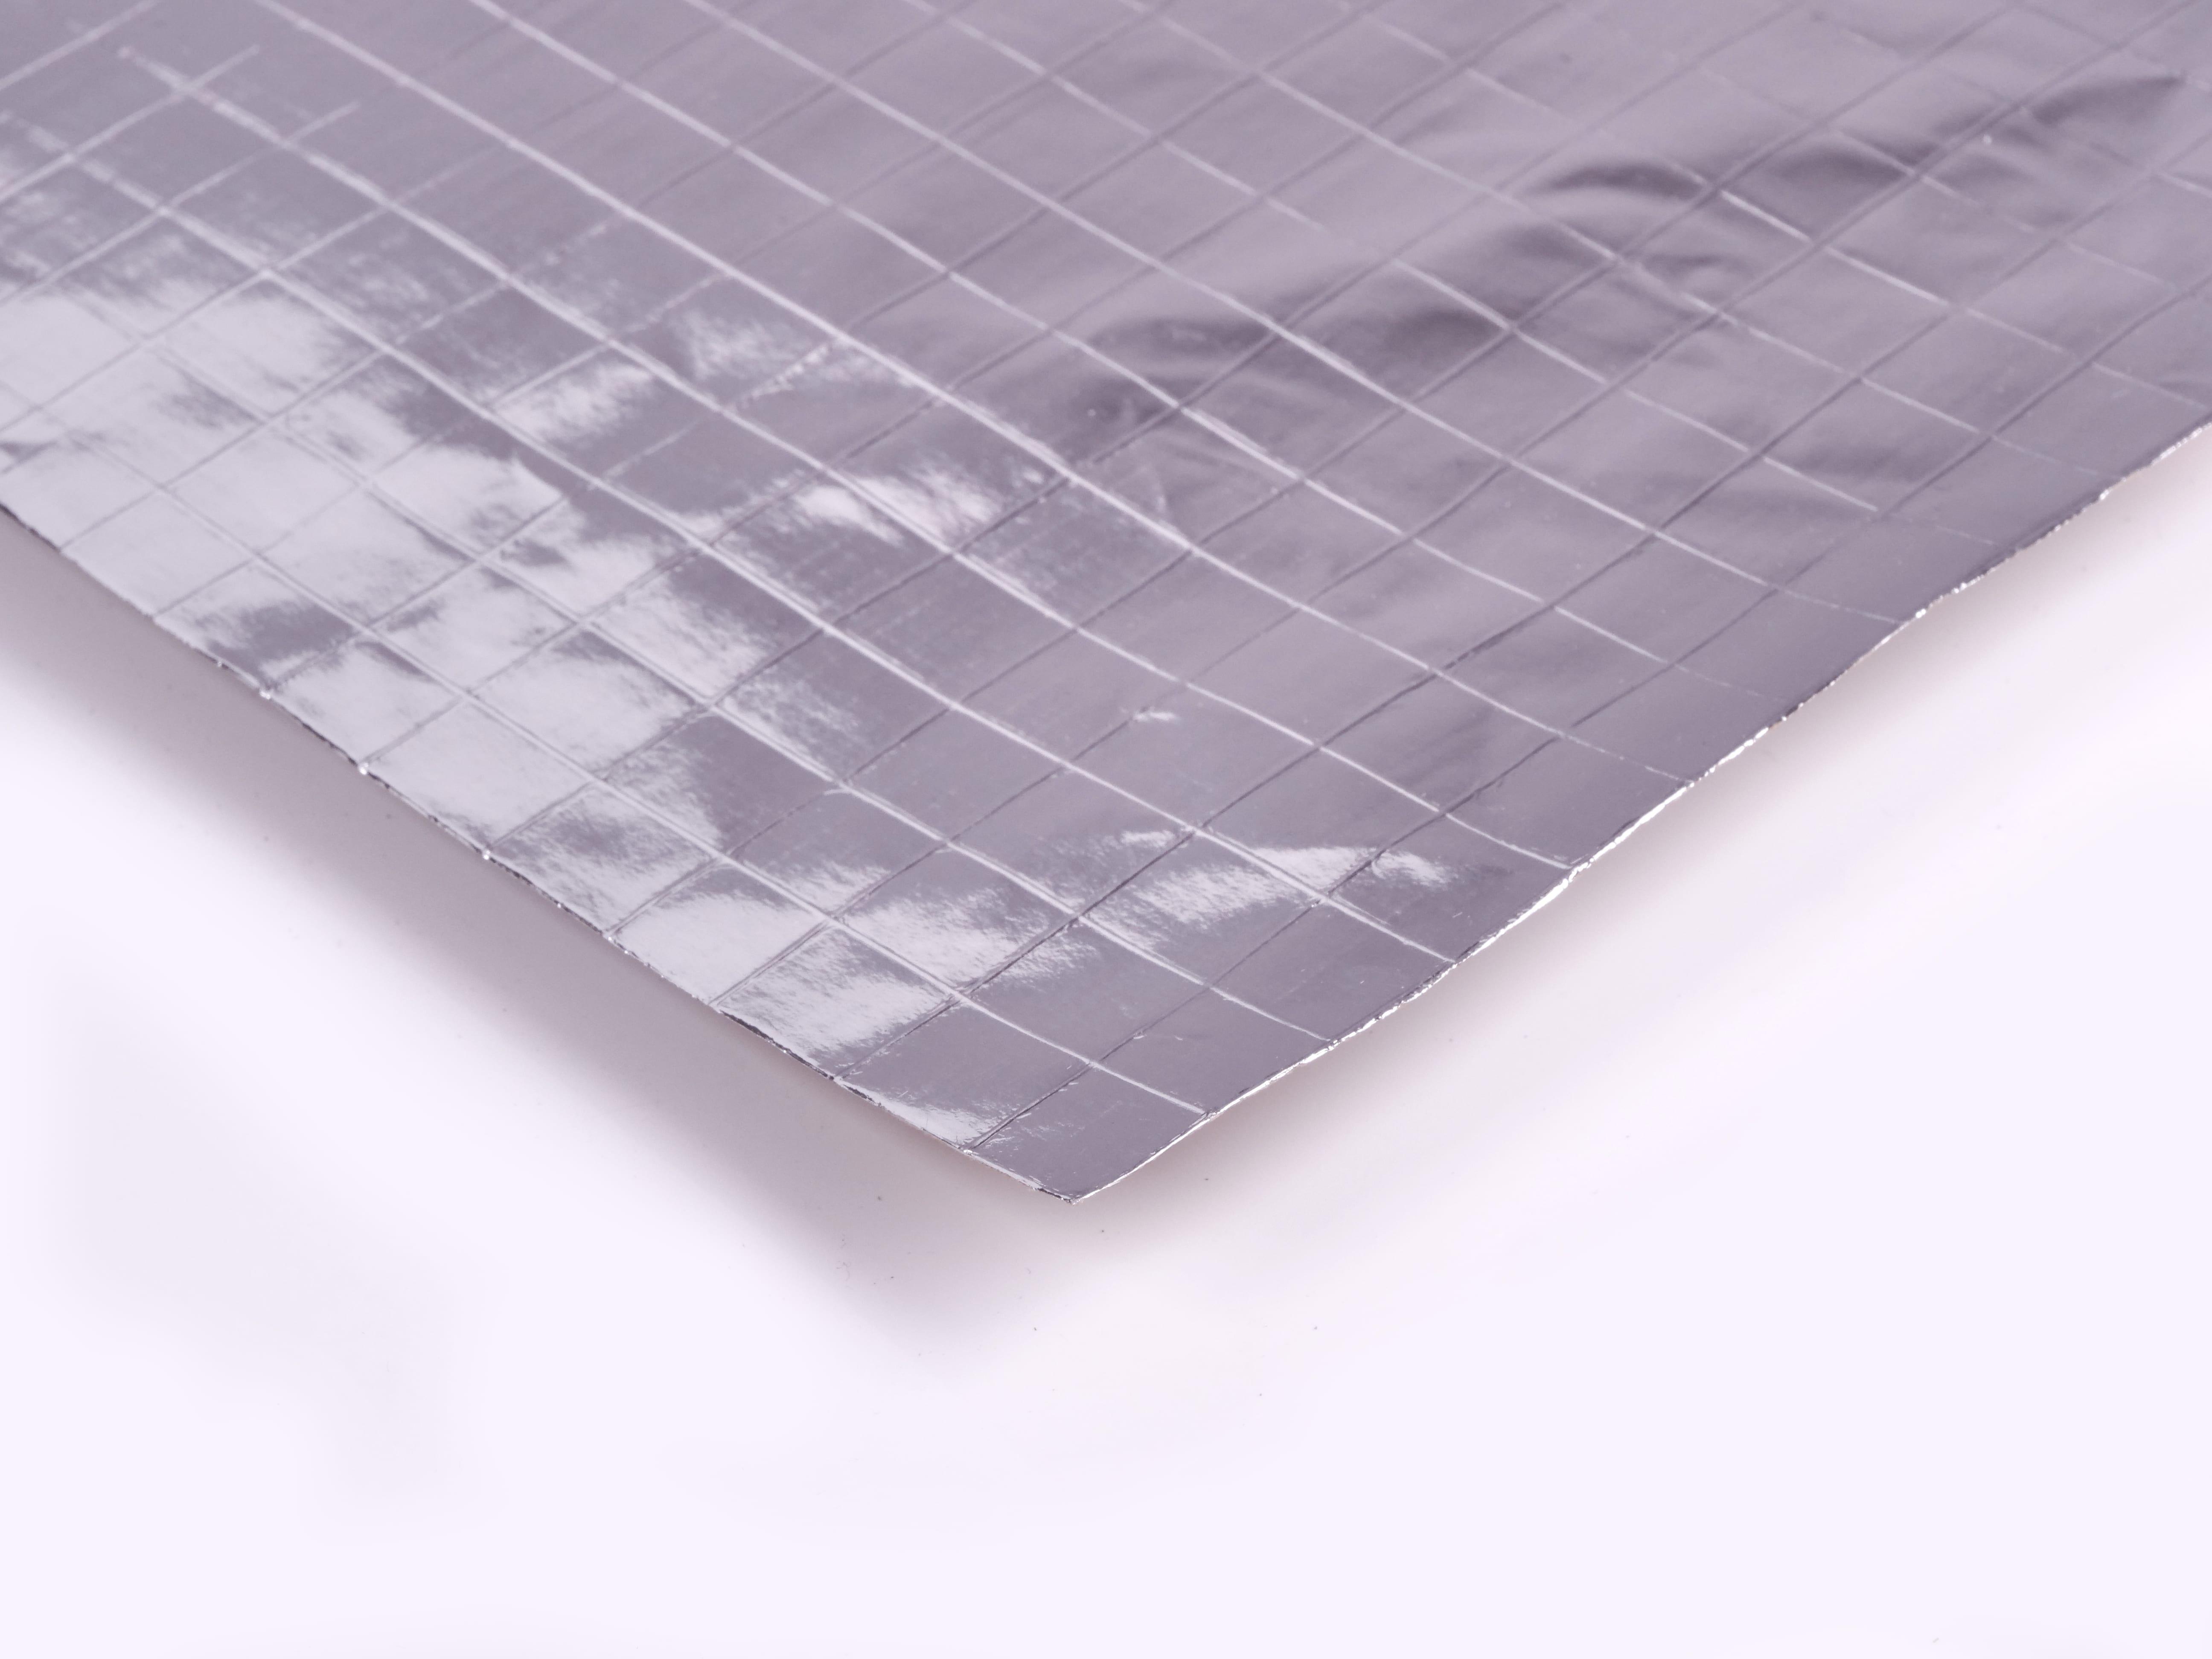 Reinforced-Aluminium-Foil-Facing-(Foil-Scrim-Kraft)